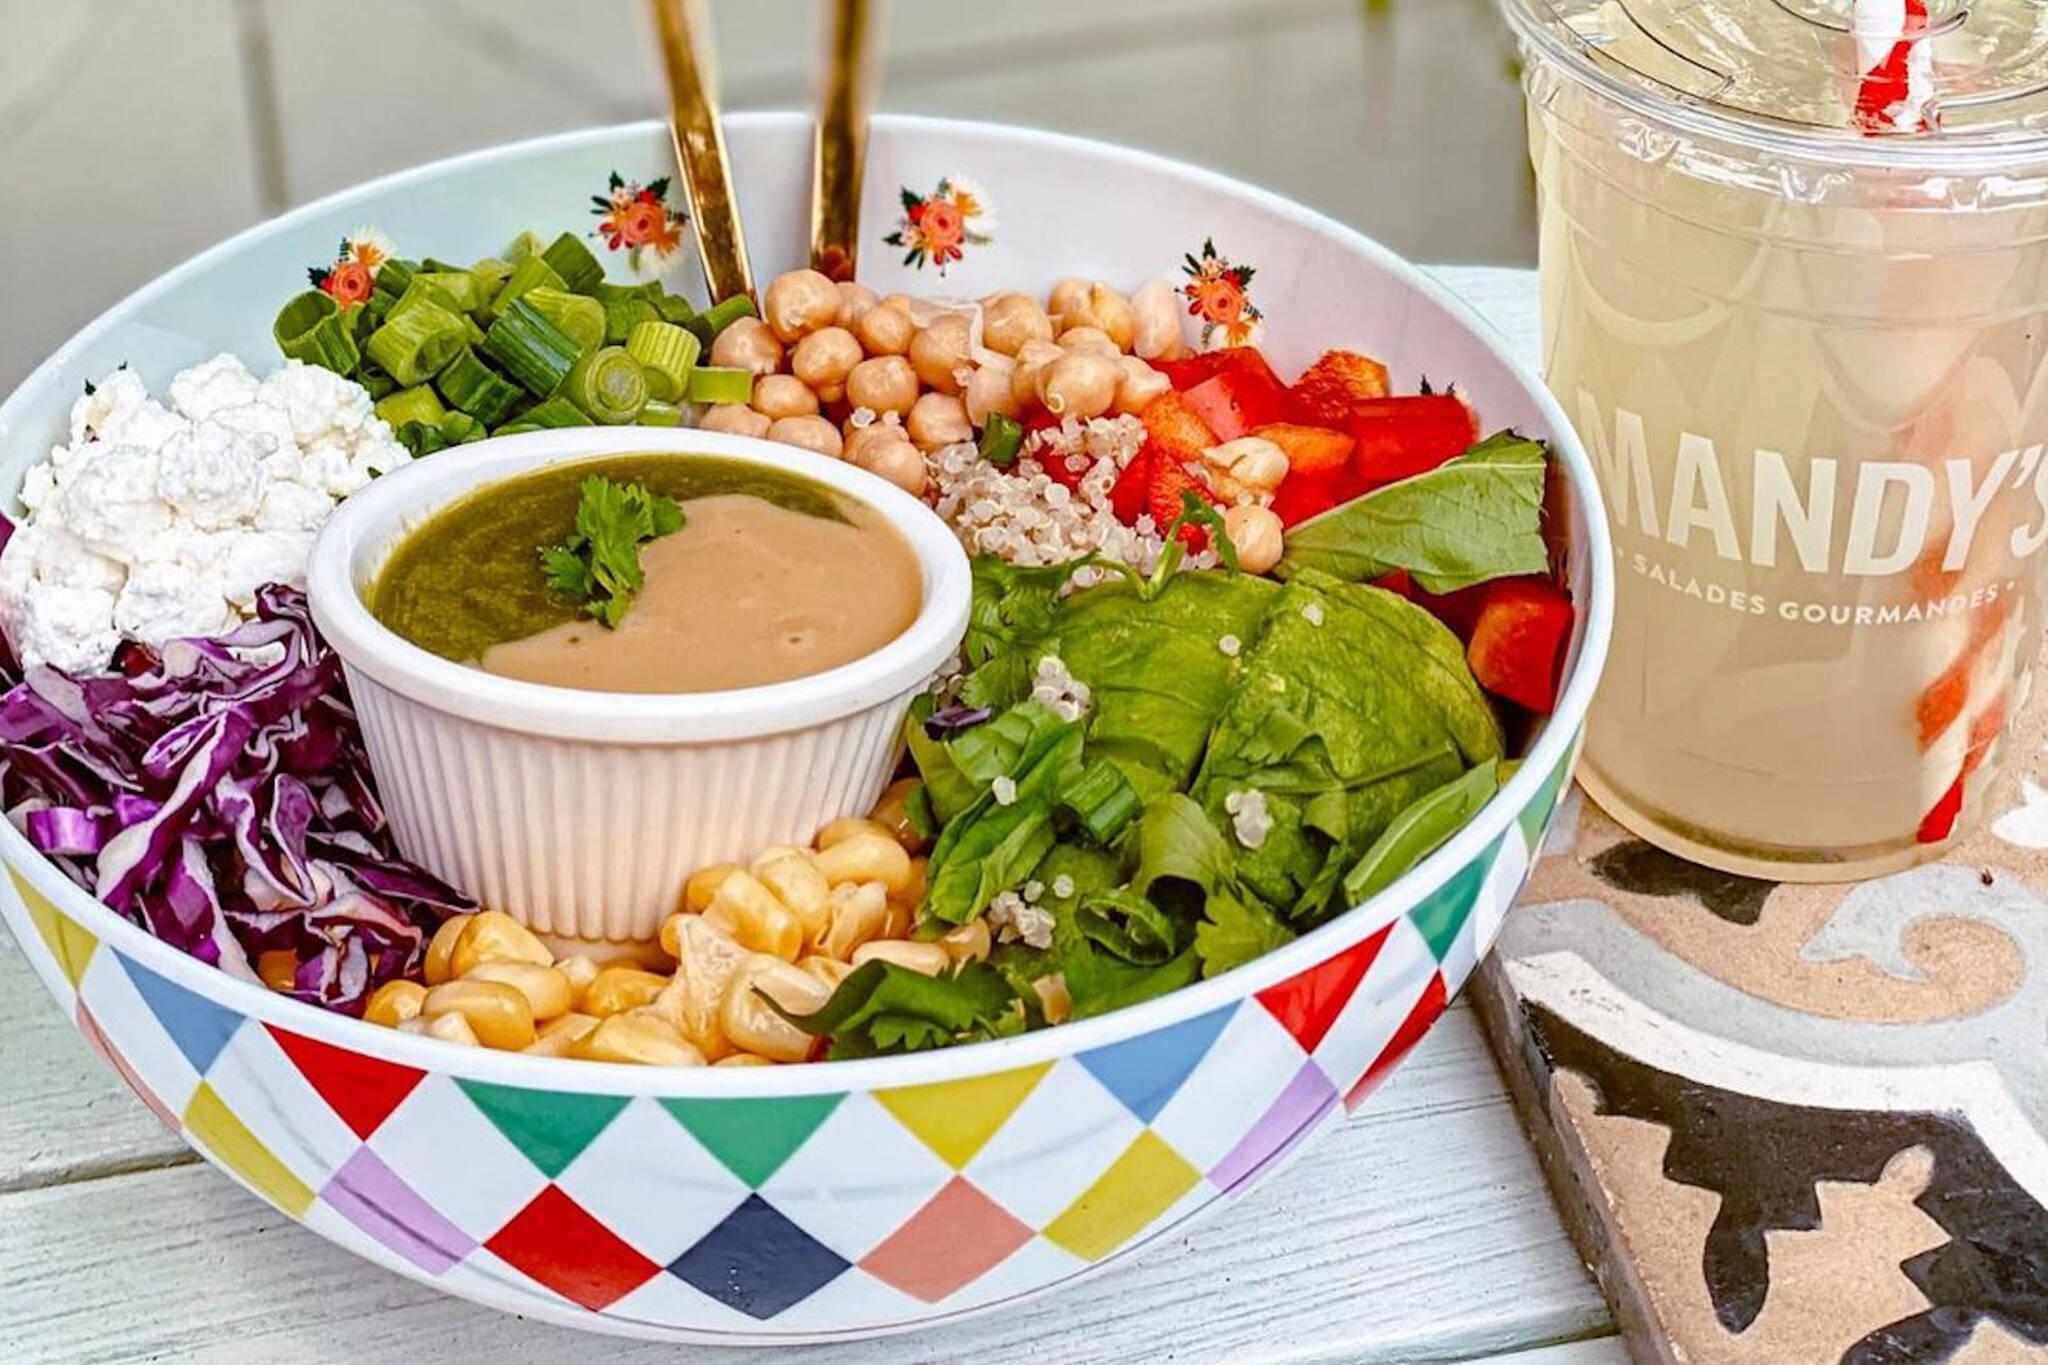 mandys salad toronto